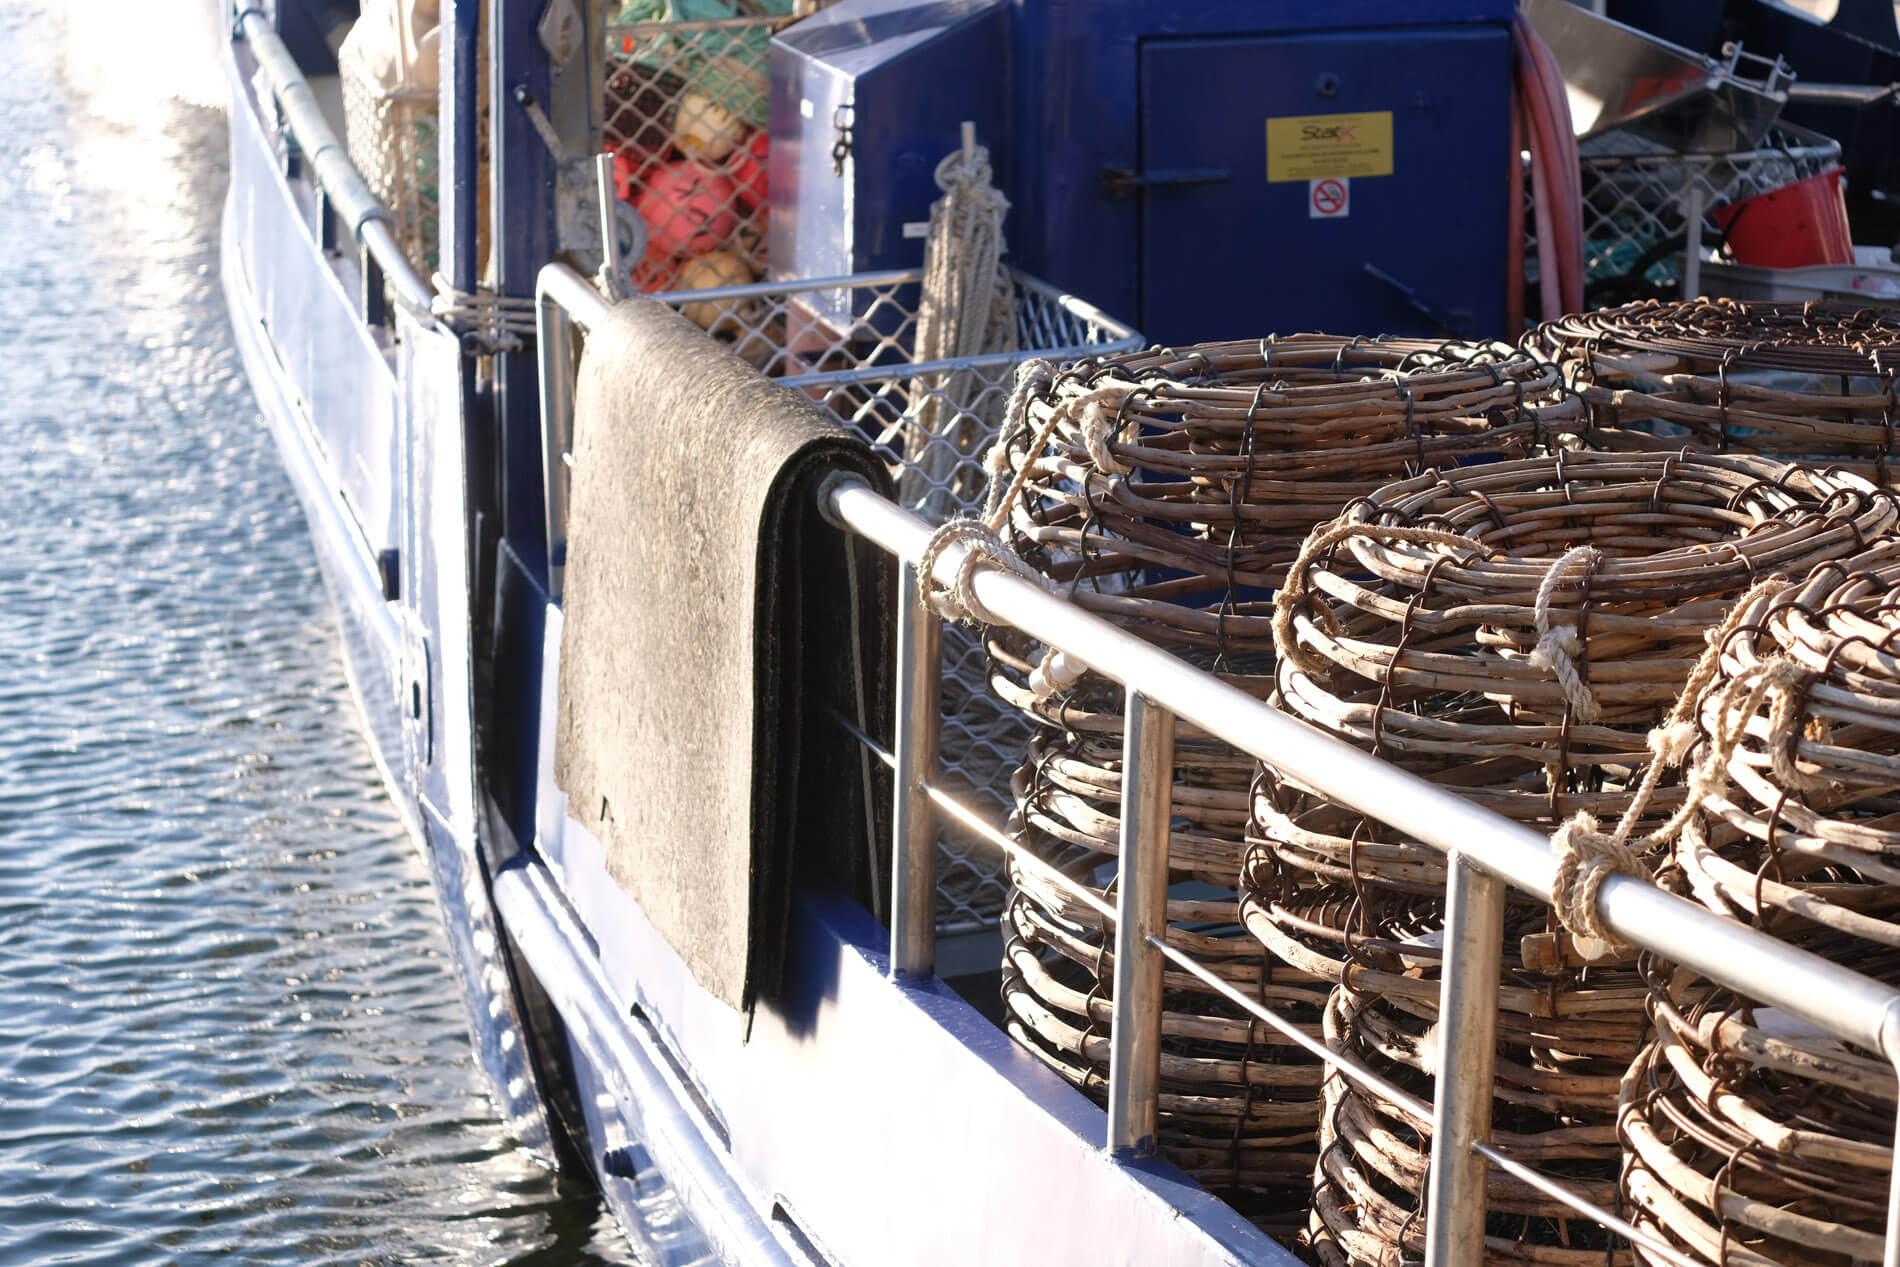 join-seafood-industry-maritime-marine-training-school-certification-australia-hobart-tasmania